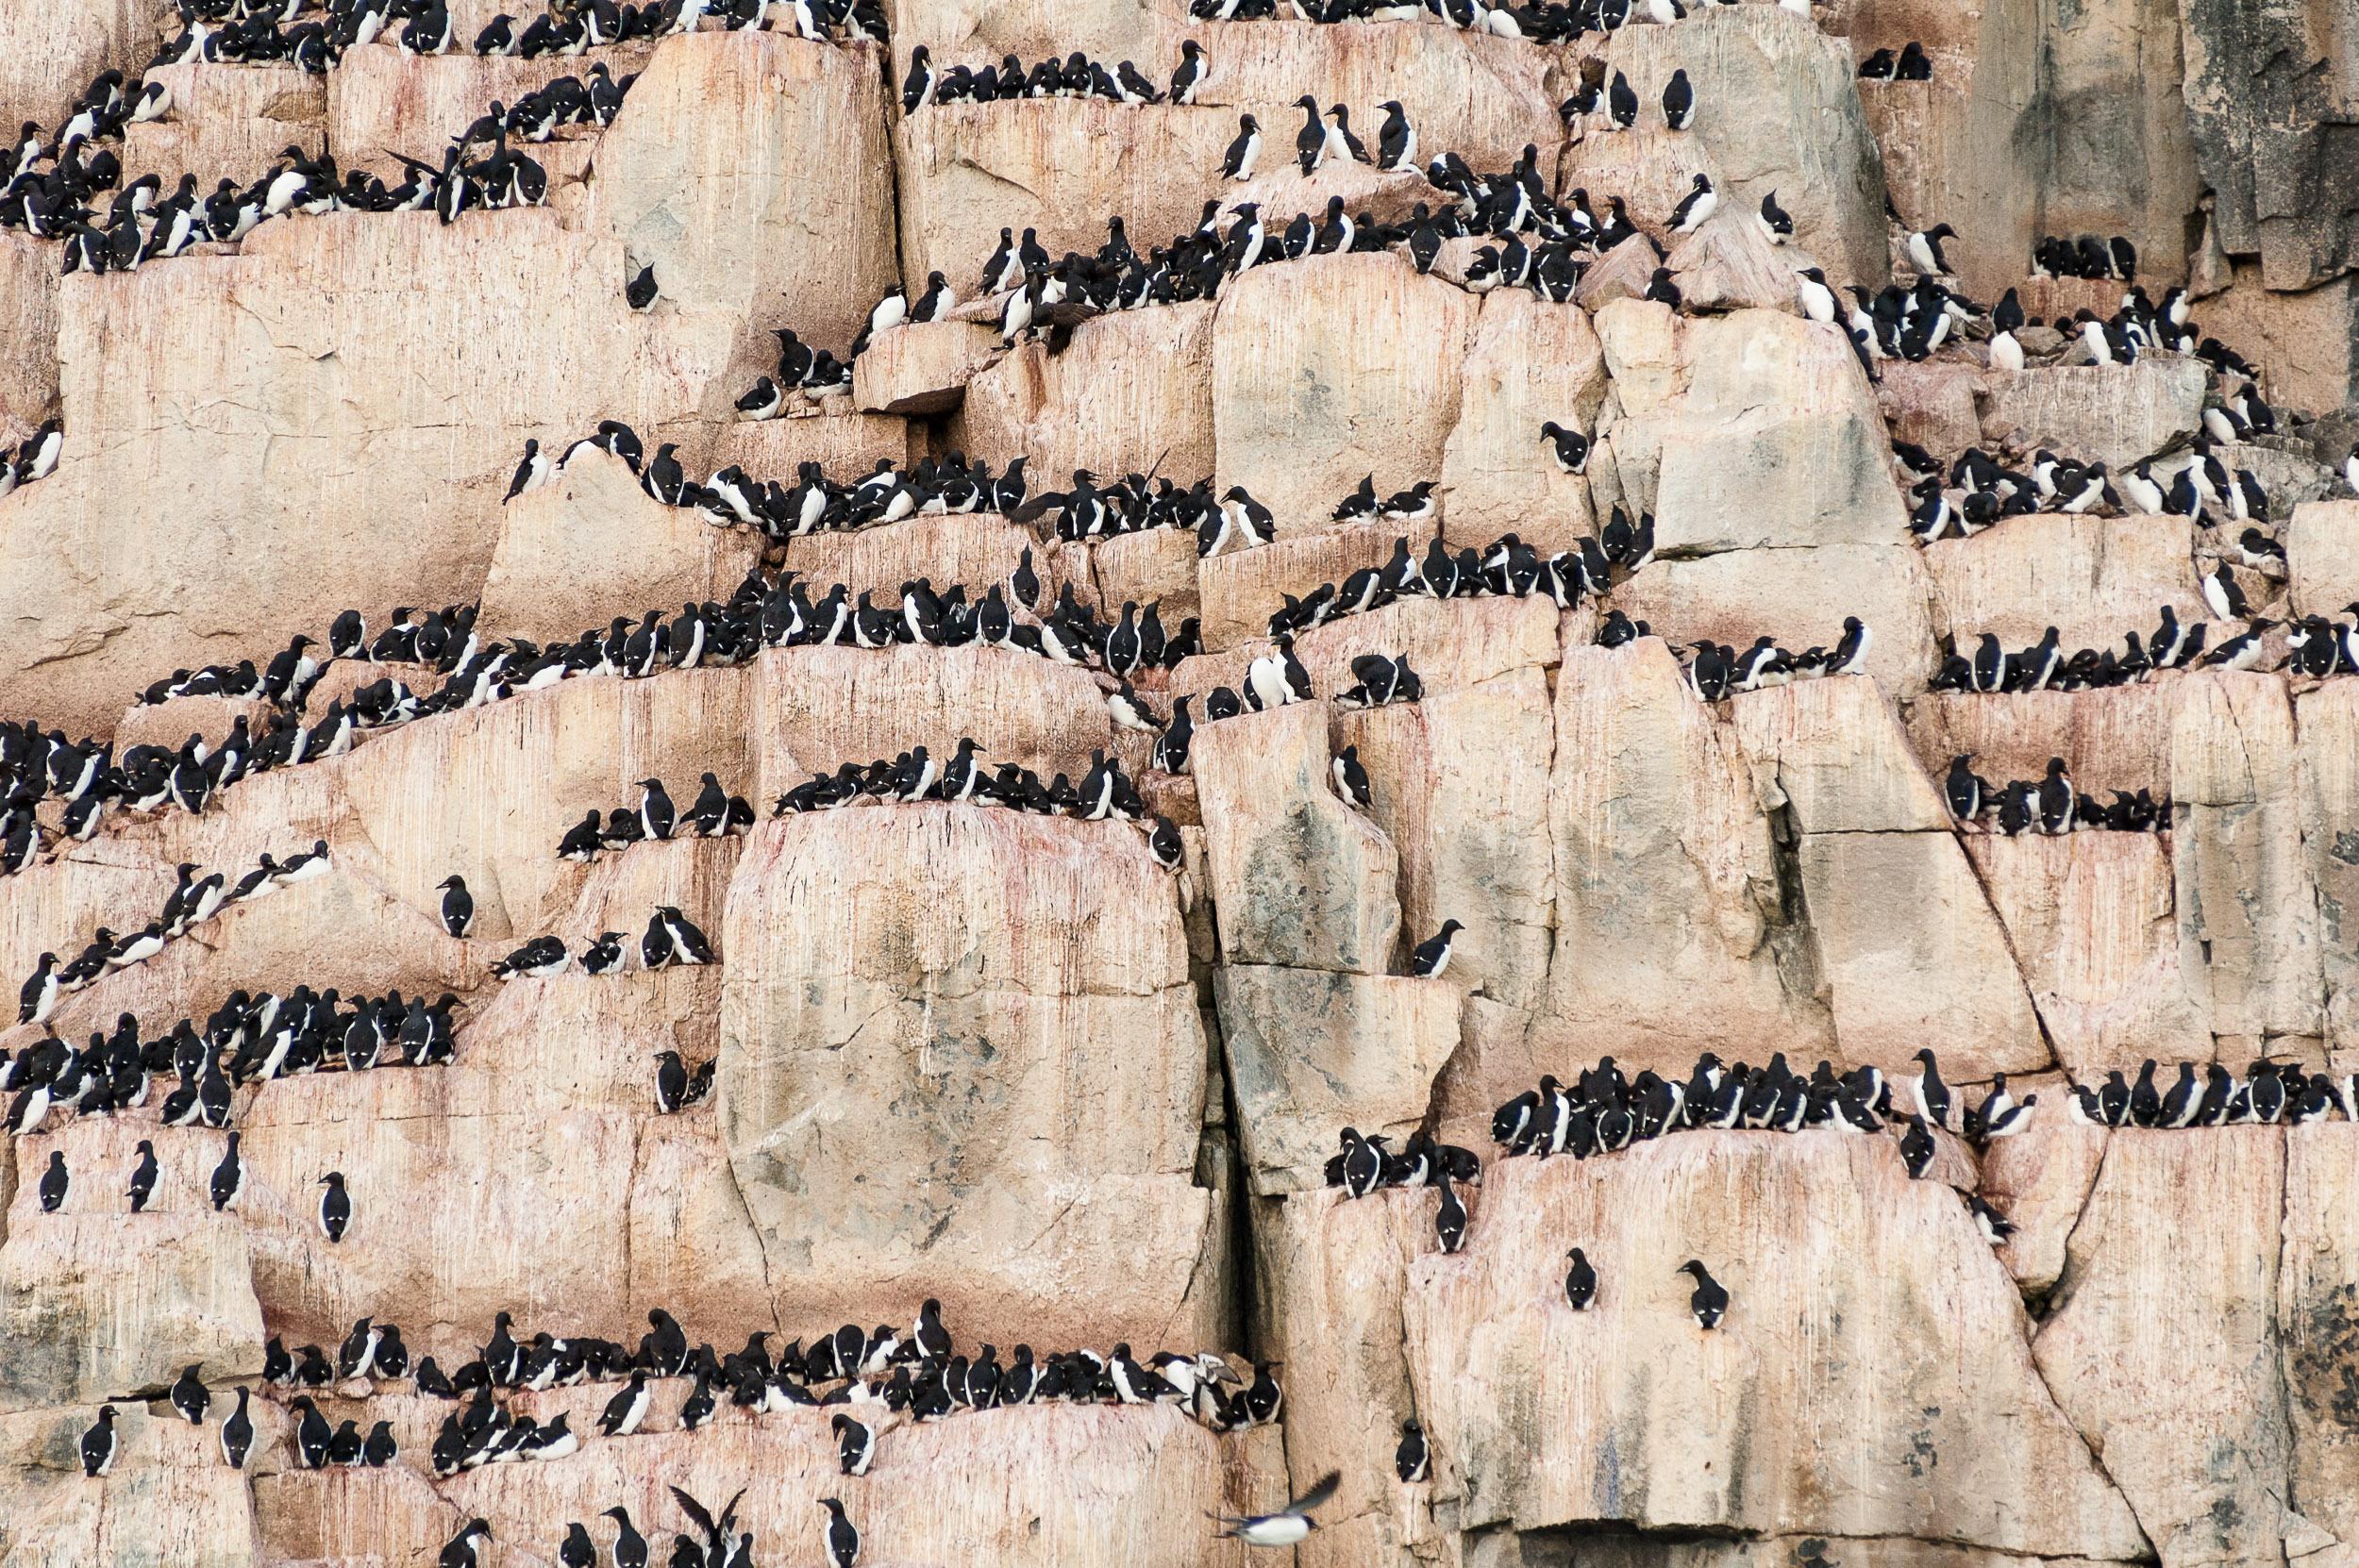 Brünnich's guillemot (Uria lomvia), bird colony on a cliff, Hinlopen Straight, Svalbard, Norway.